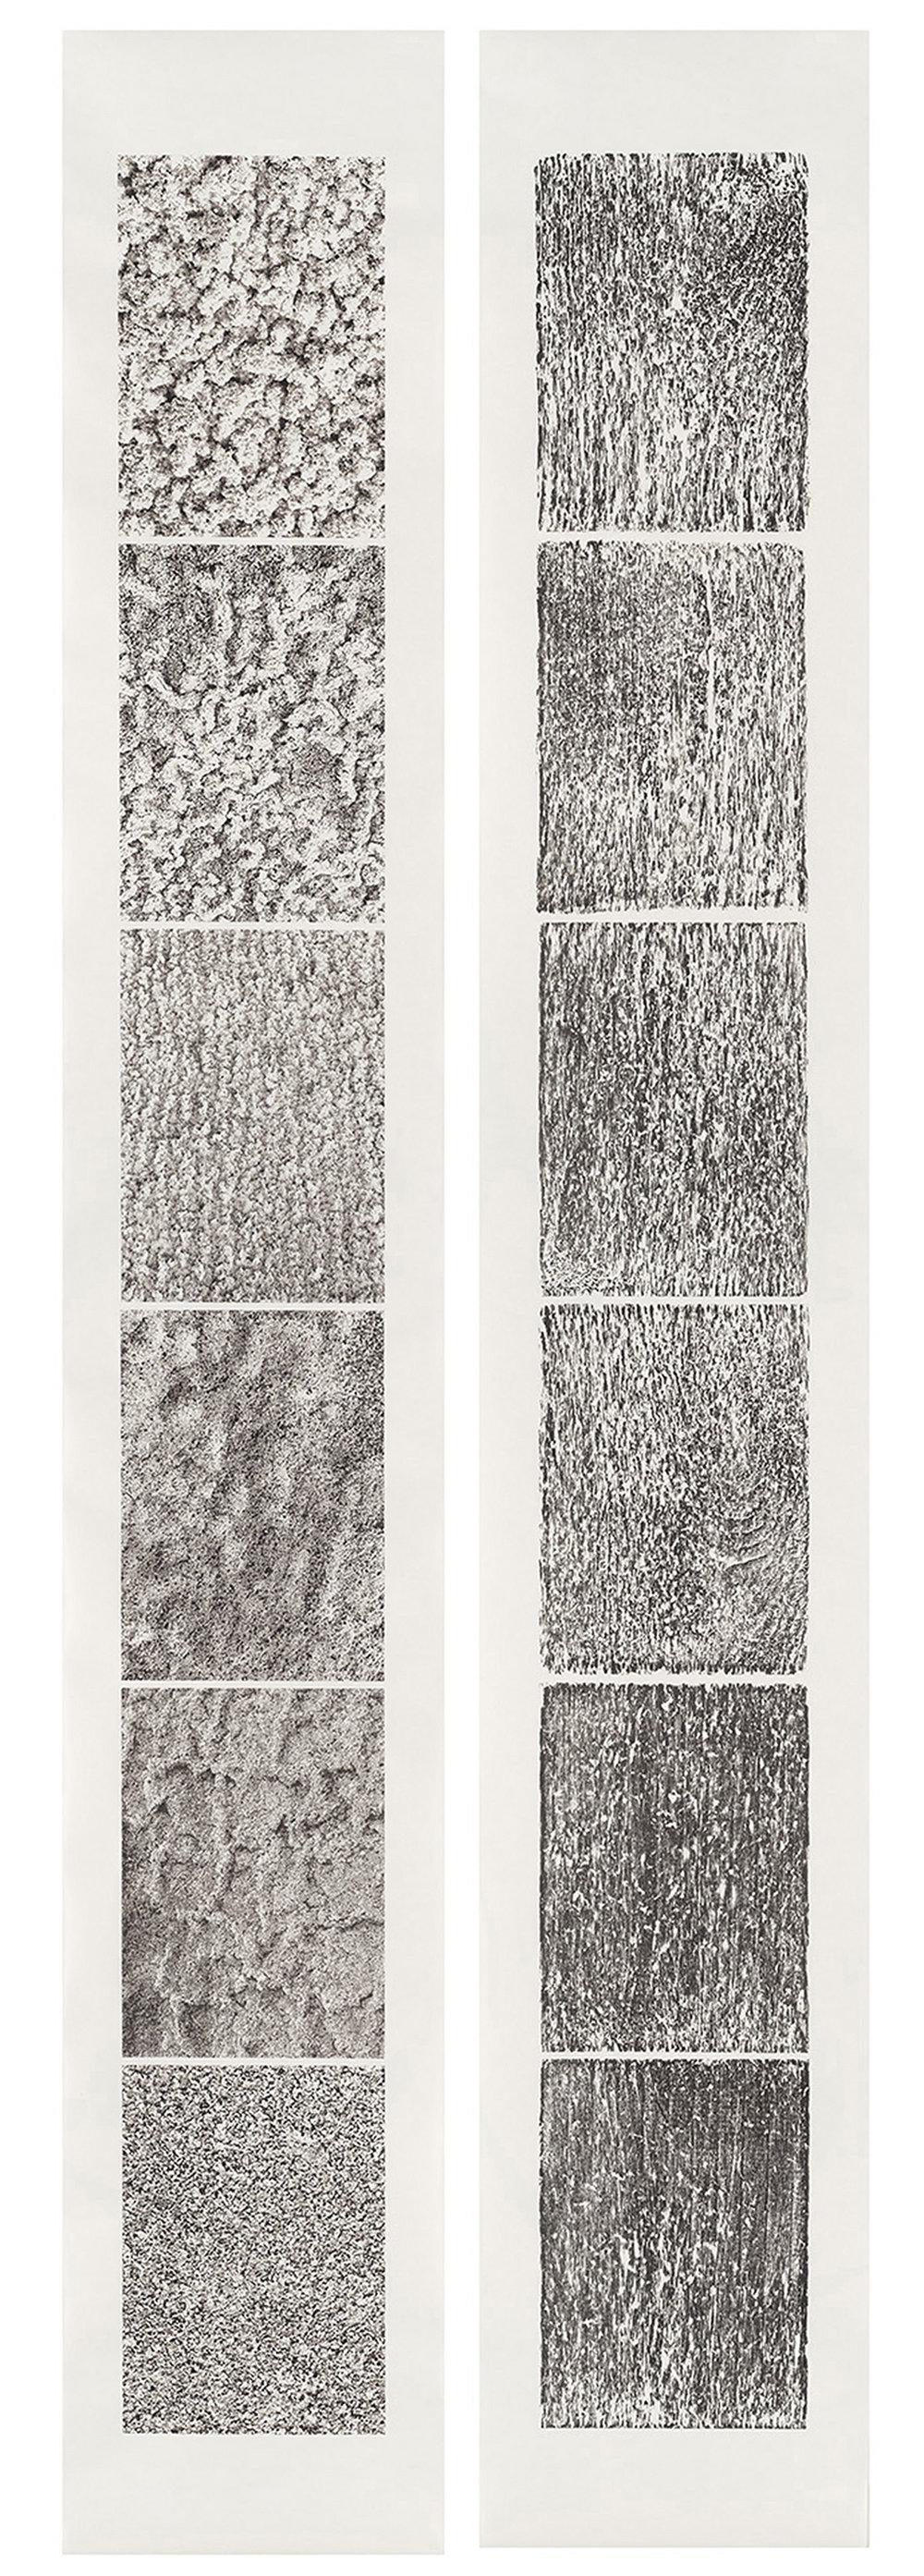 Trace: Edge of the Pleistocene